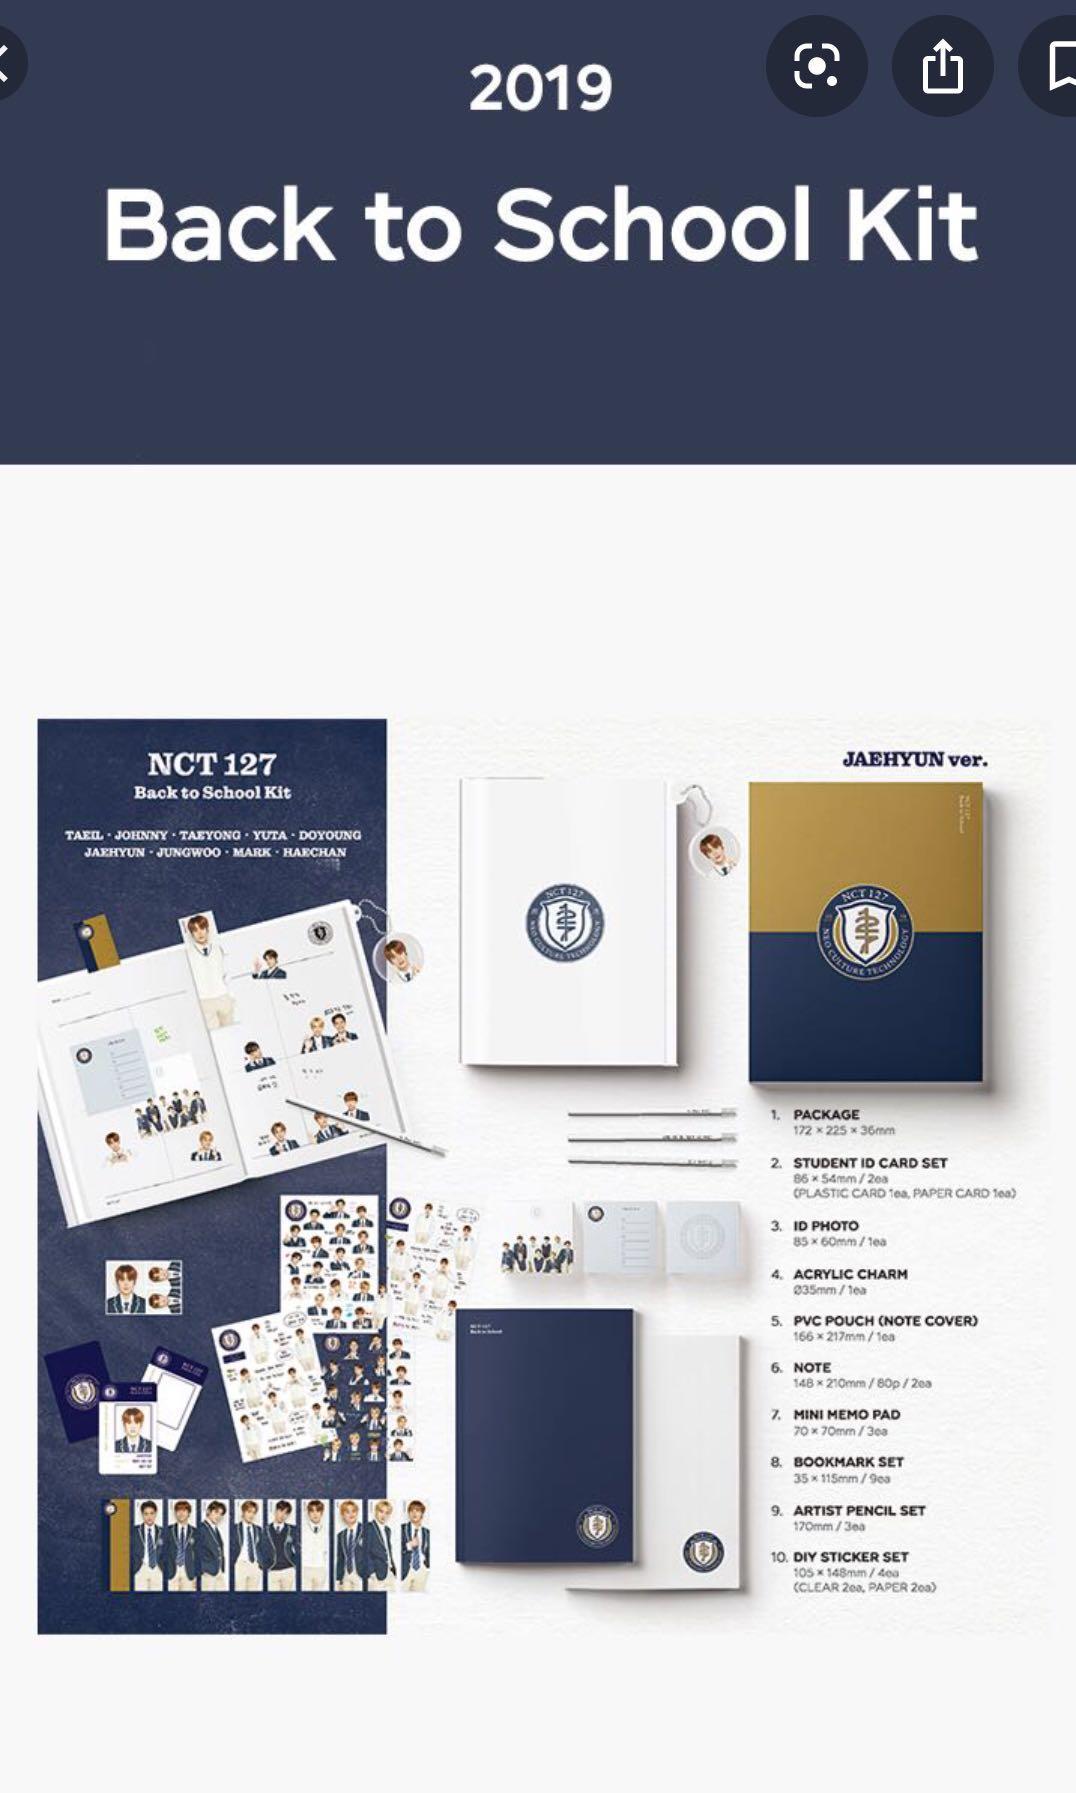 [WTB] nct 127 back to school kit full set ( TAEYONG )